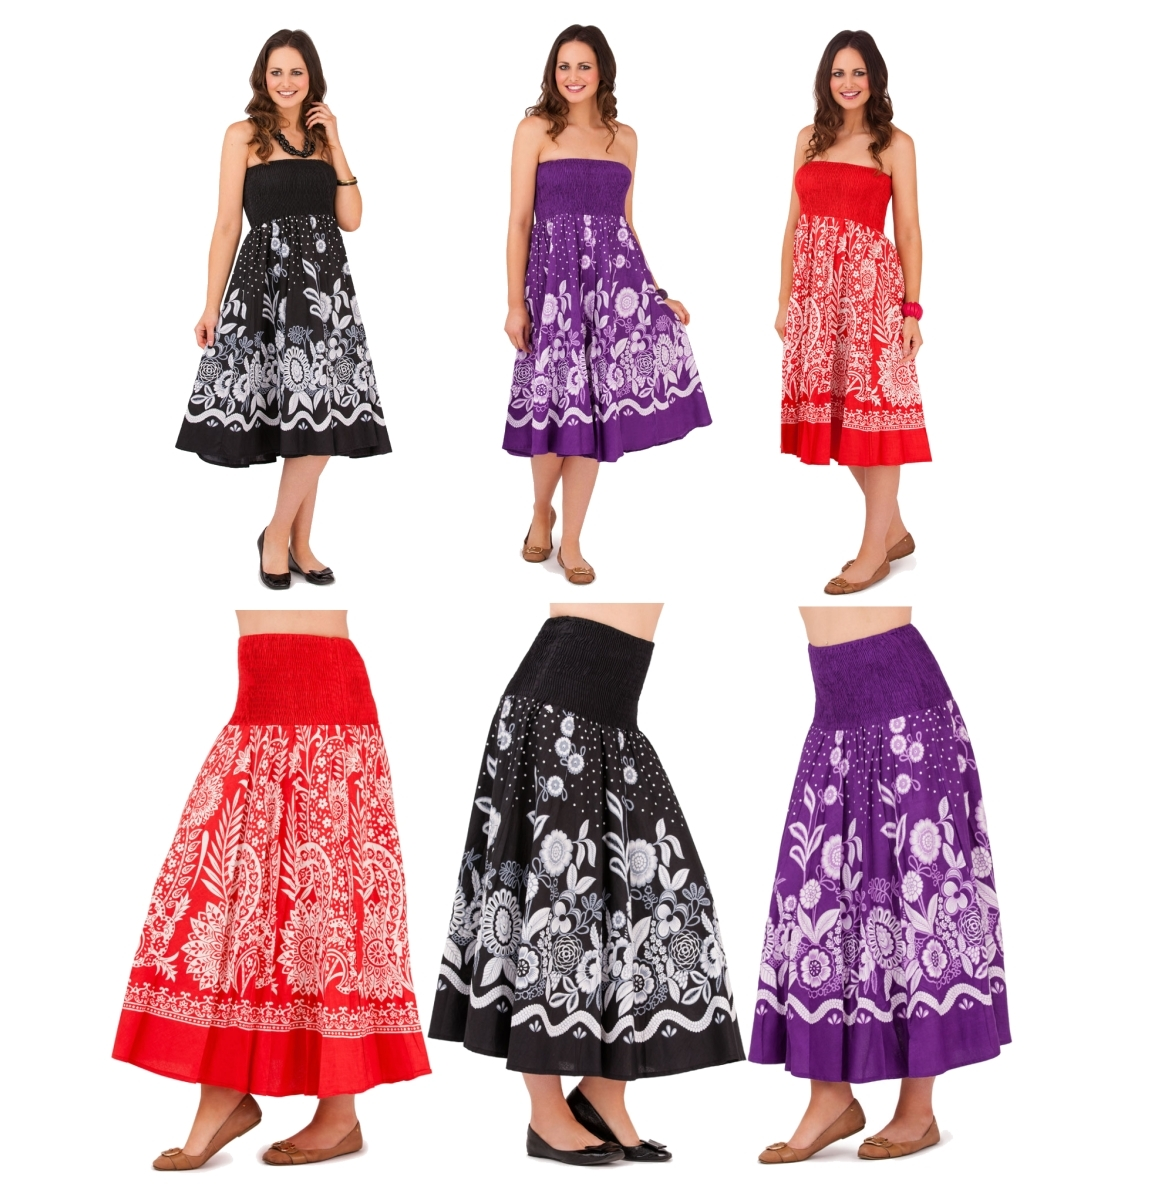 72dd5ca478b WOMENS COTTON 2 IN 1 STRAPLESS DRESS + ELASTICATED LONG MAXI SUMMER SKIRT  LADIES